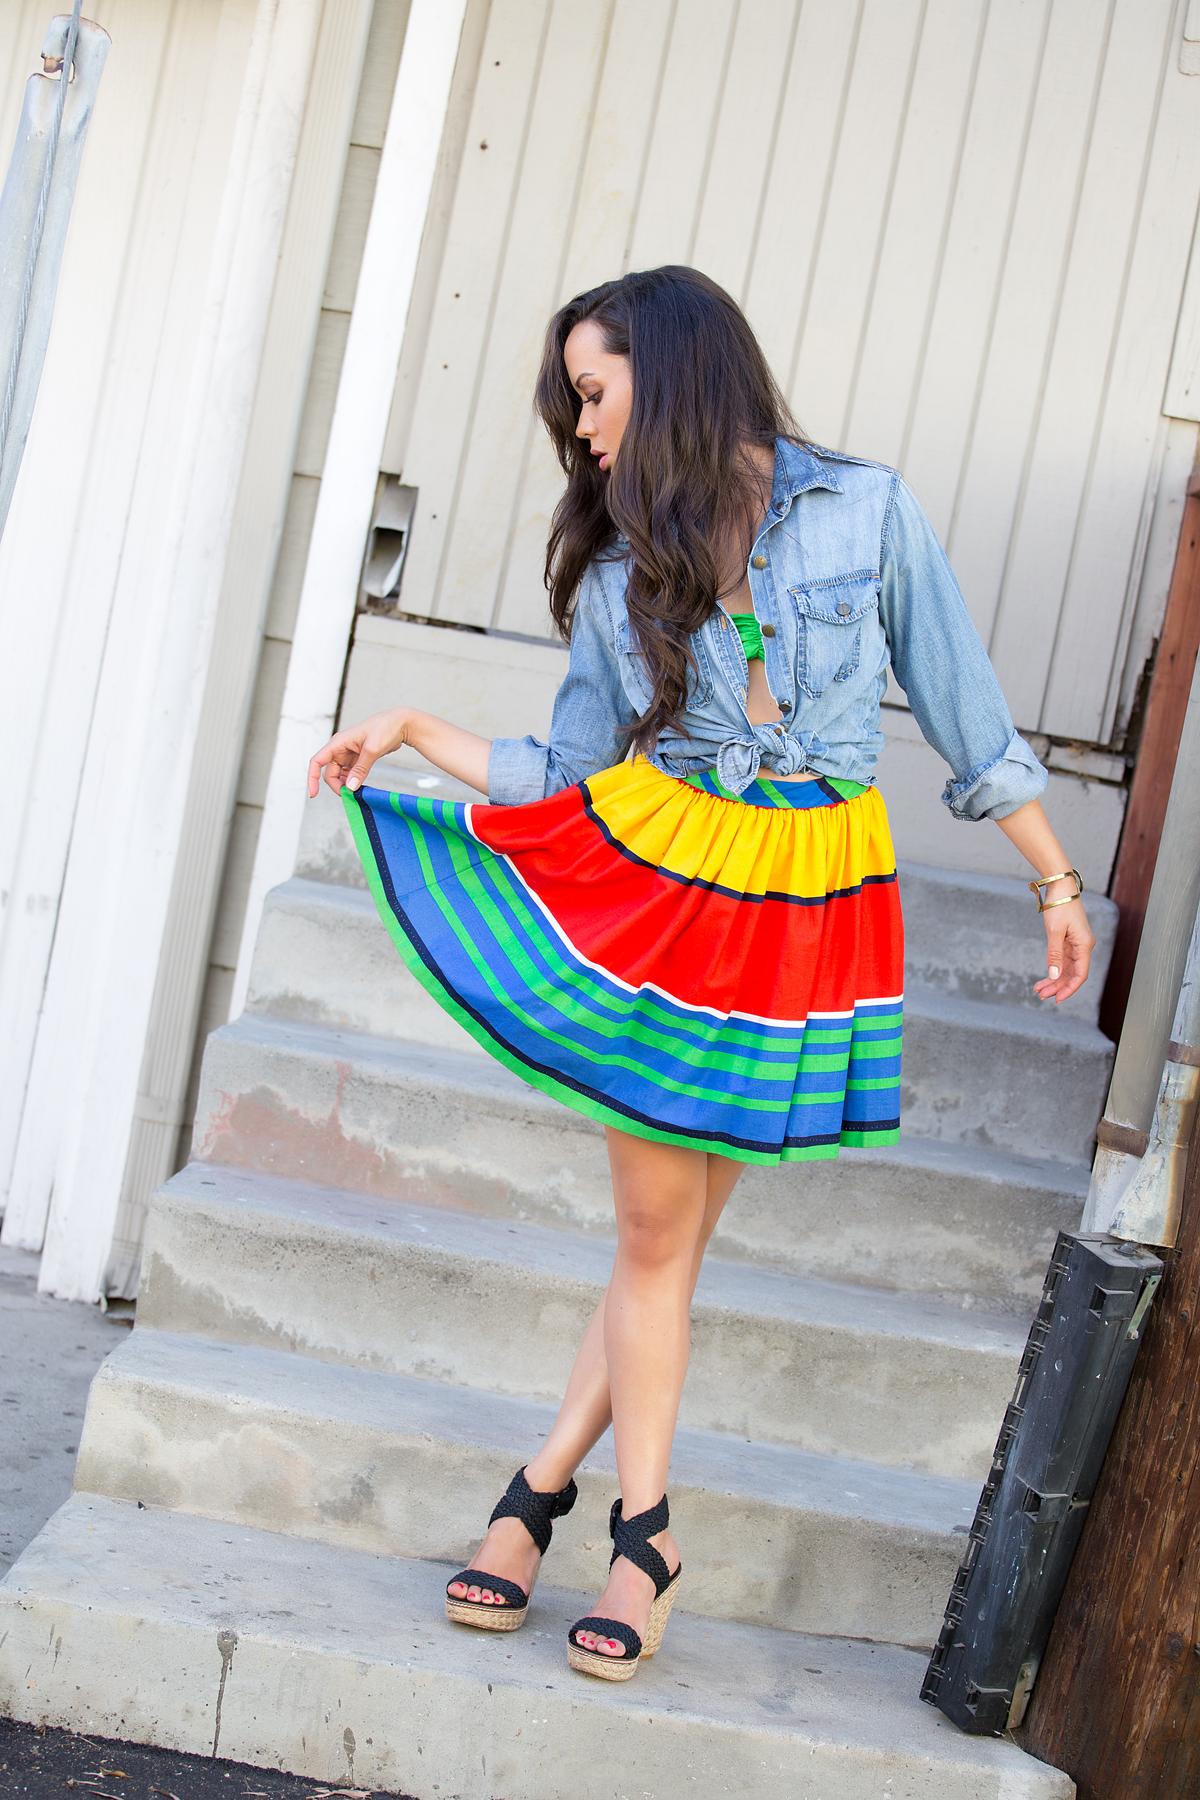 los angeles fashion, fashion blog, style blog, la model, current elliott shirt, denim shirt, two piece, crop top, stuart weitzman wedges, shareen vintage, vintage clothing